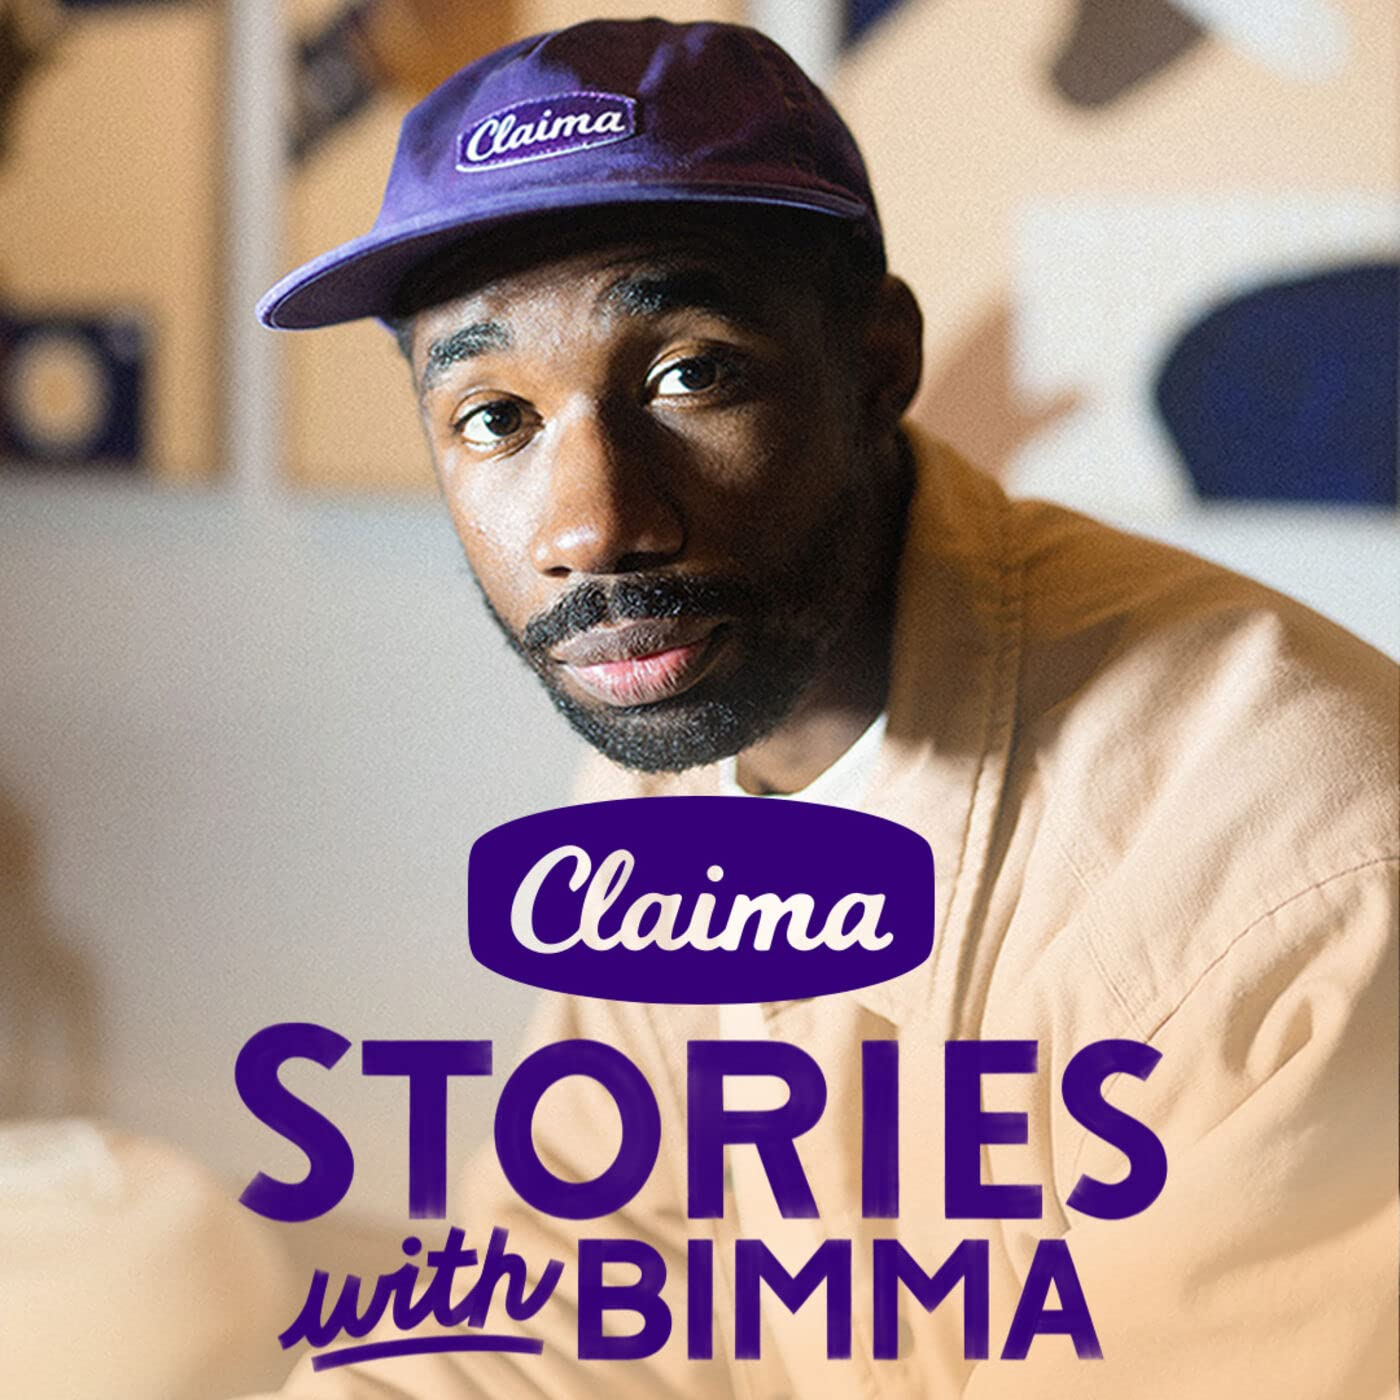 Claima Stories with Bimma